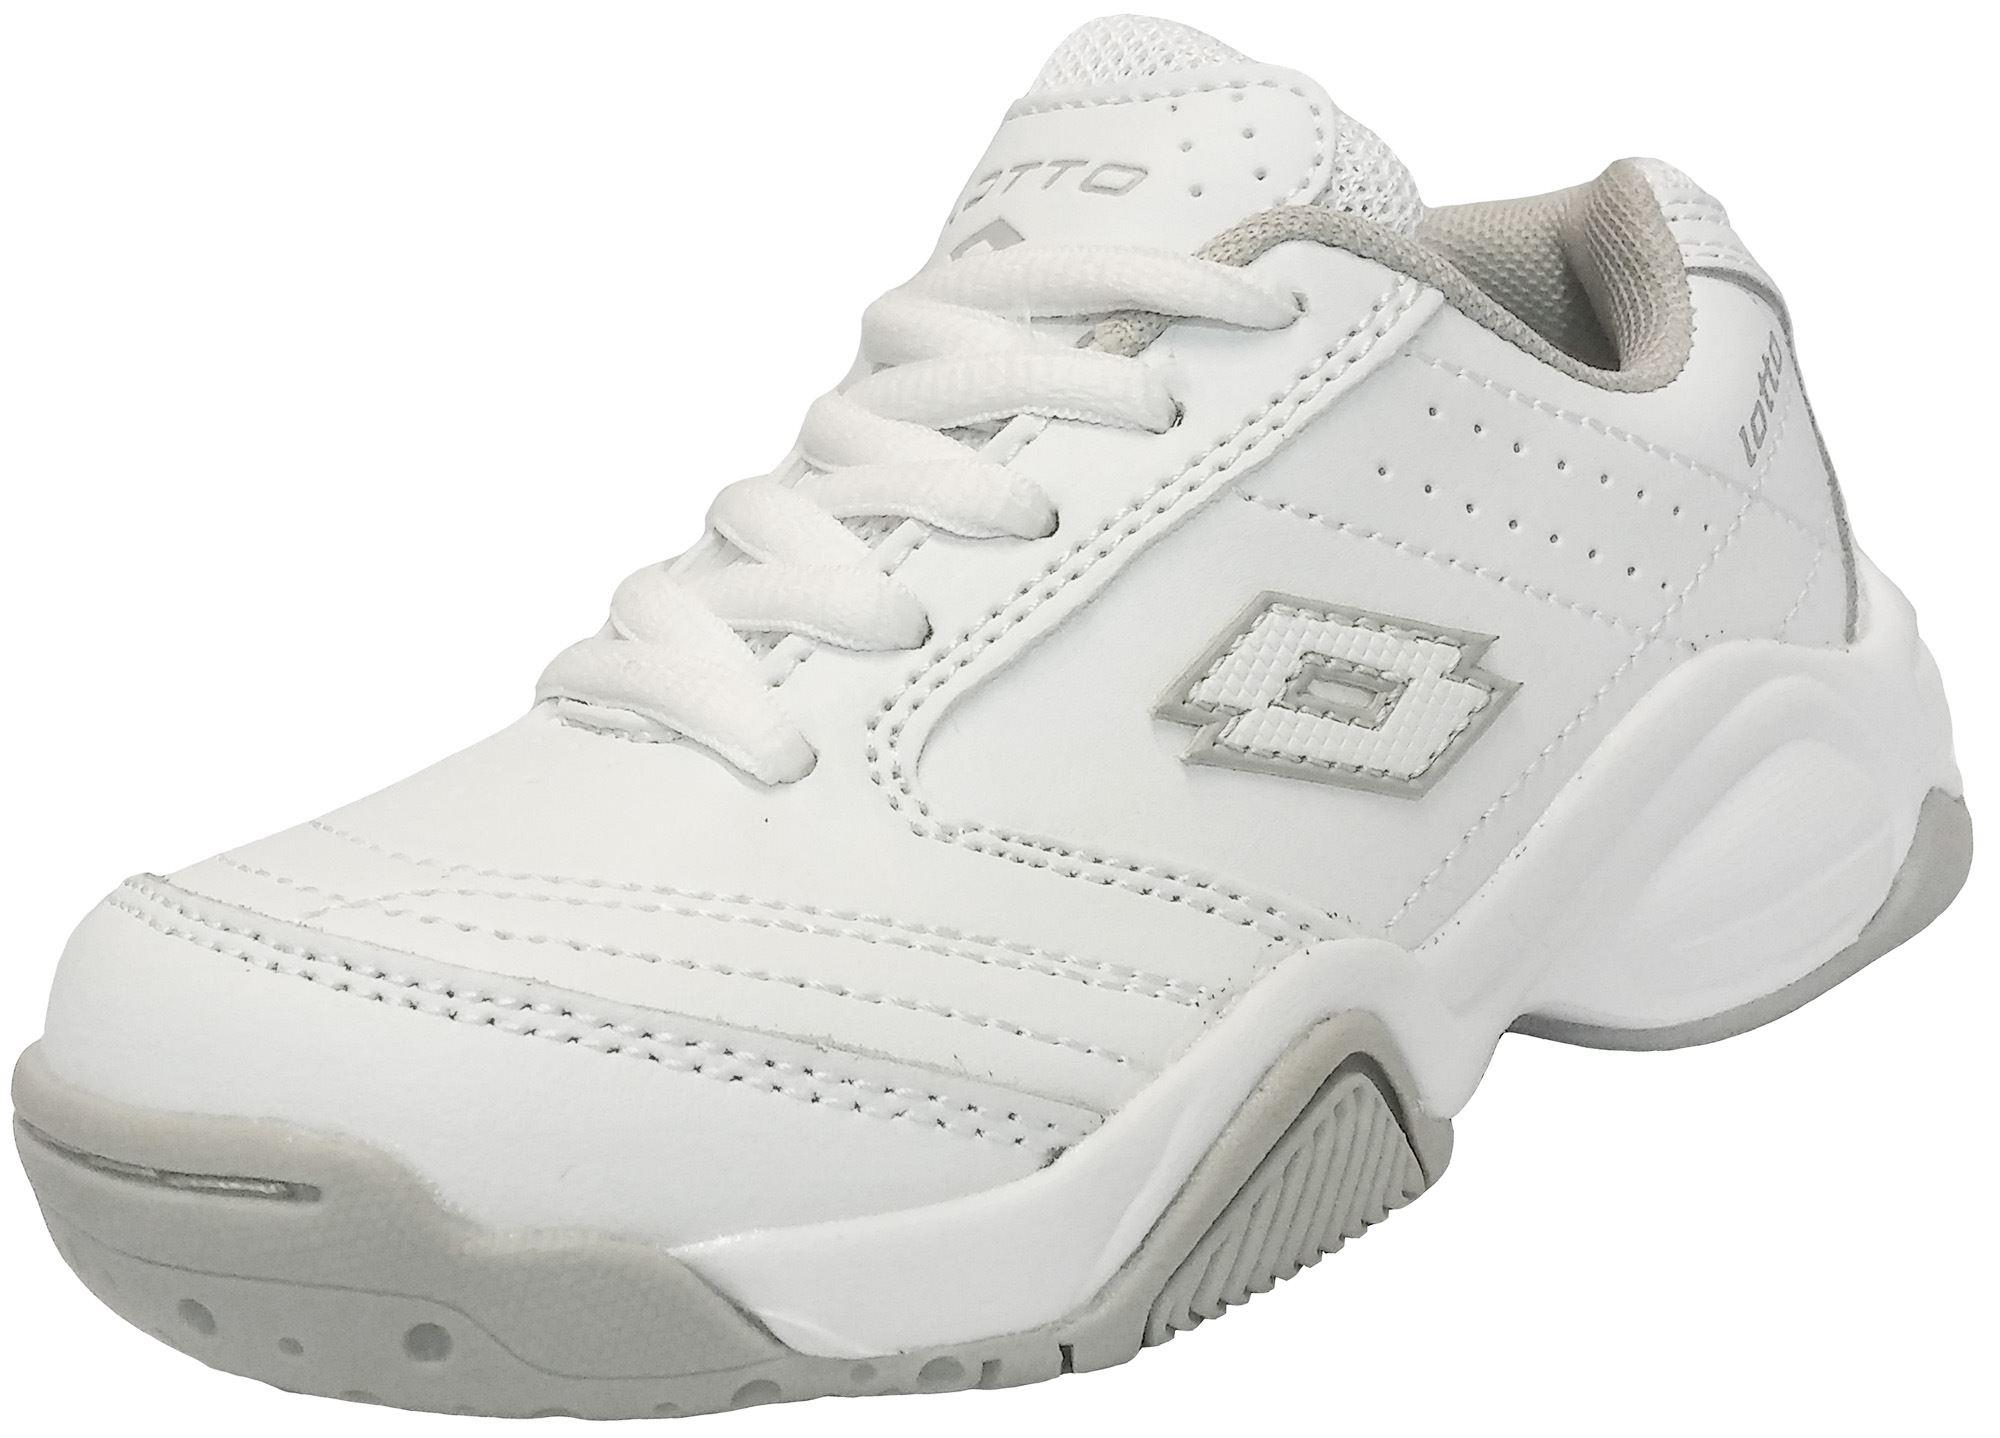 Zapatos blancos Lotto infantiles QPCIzVqBe